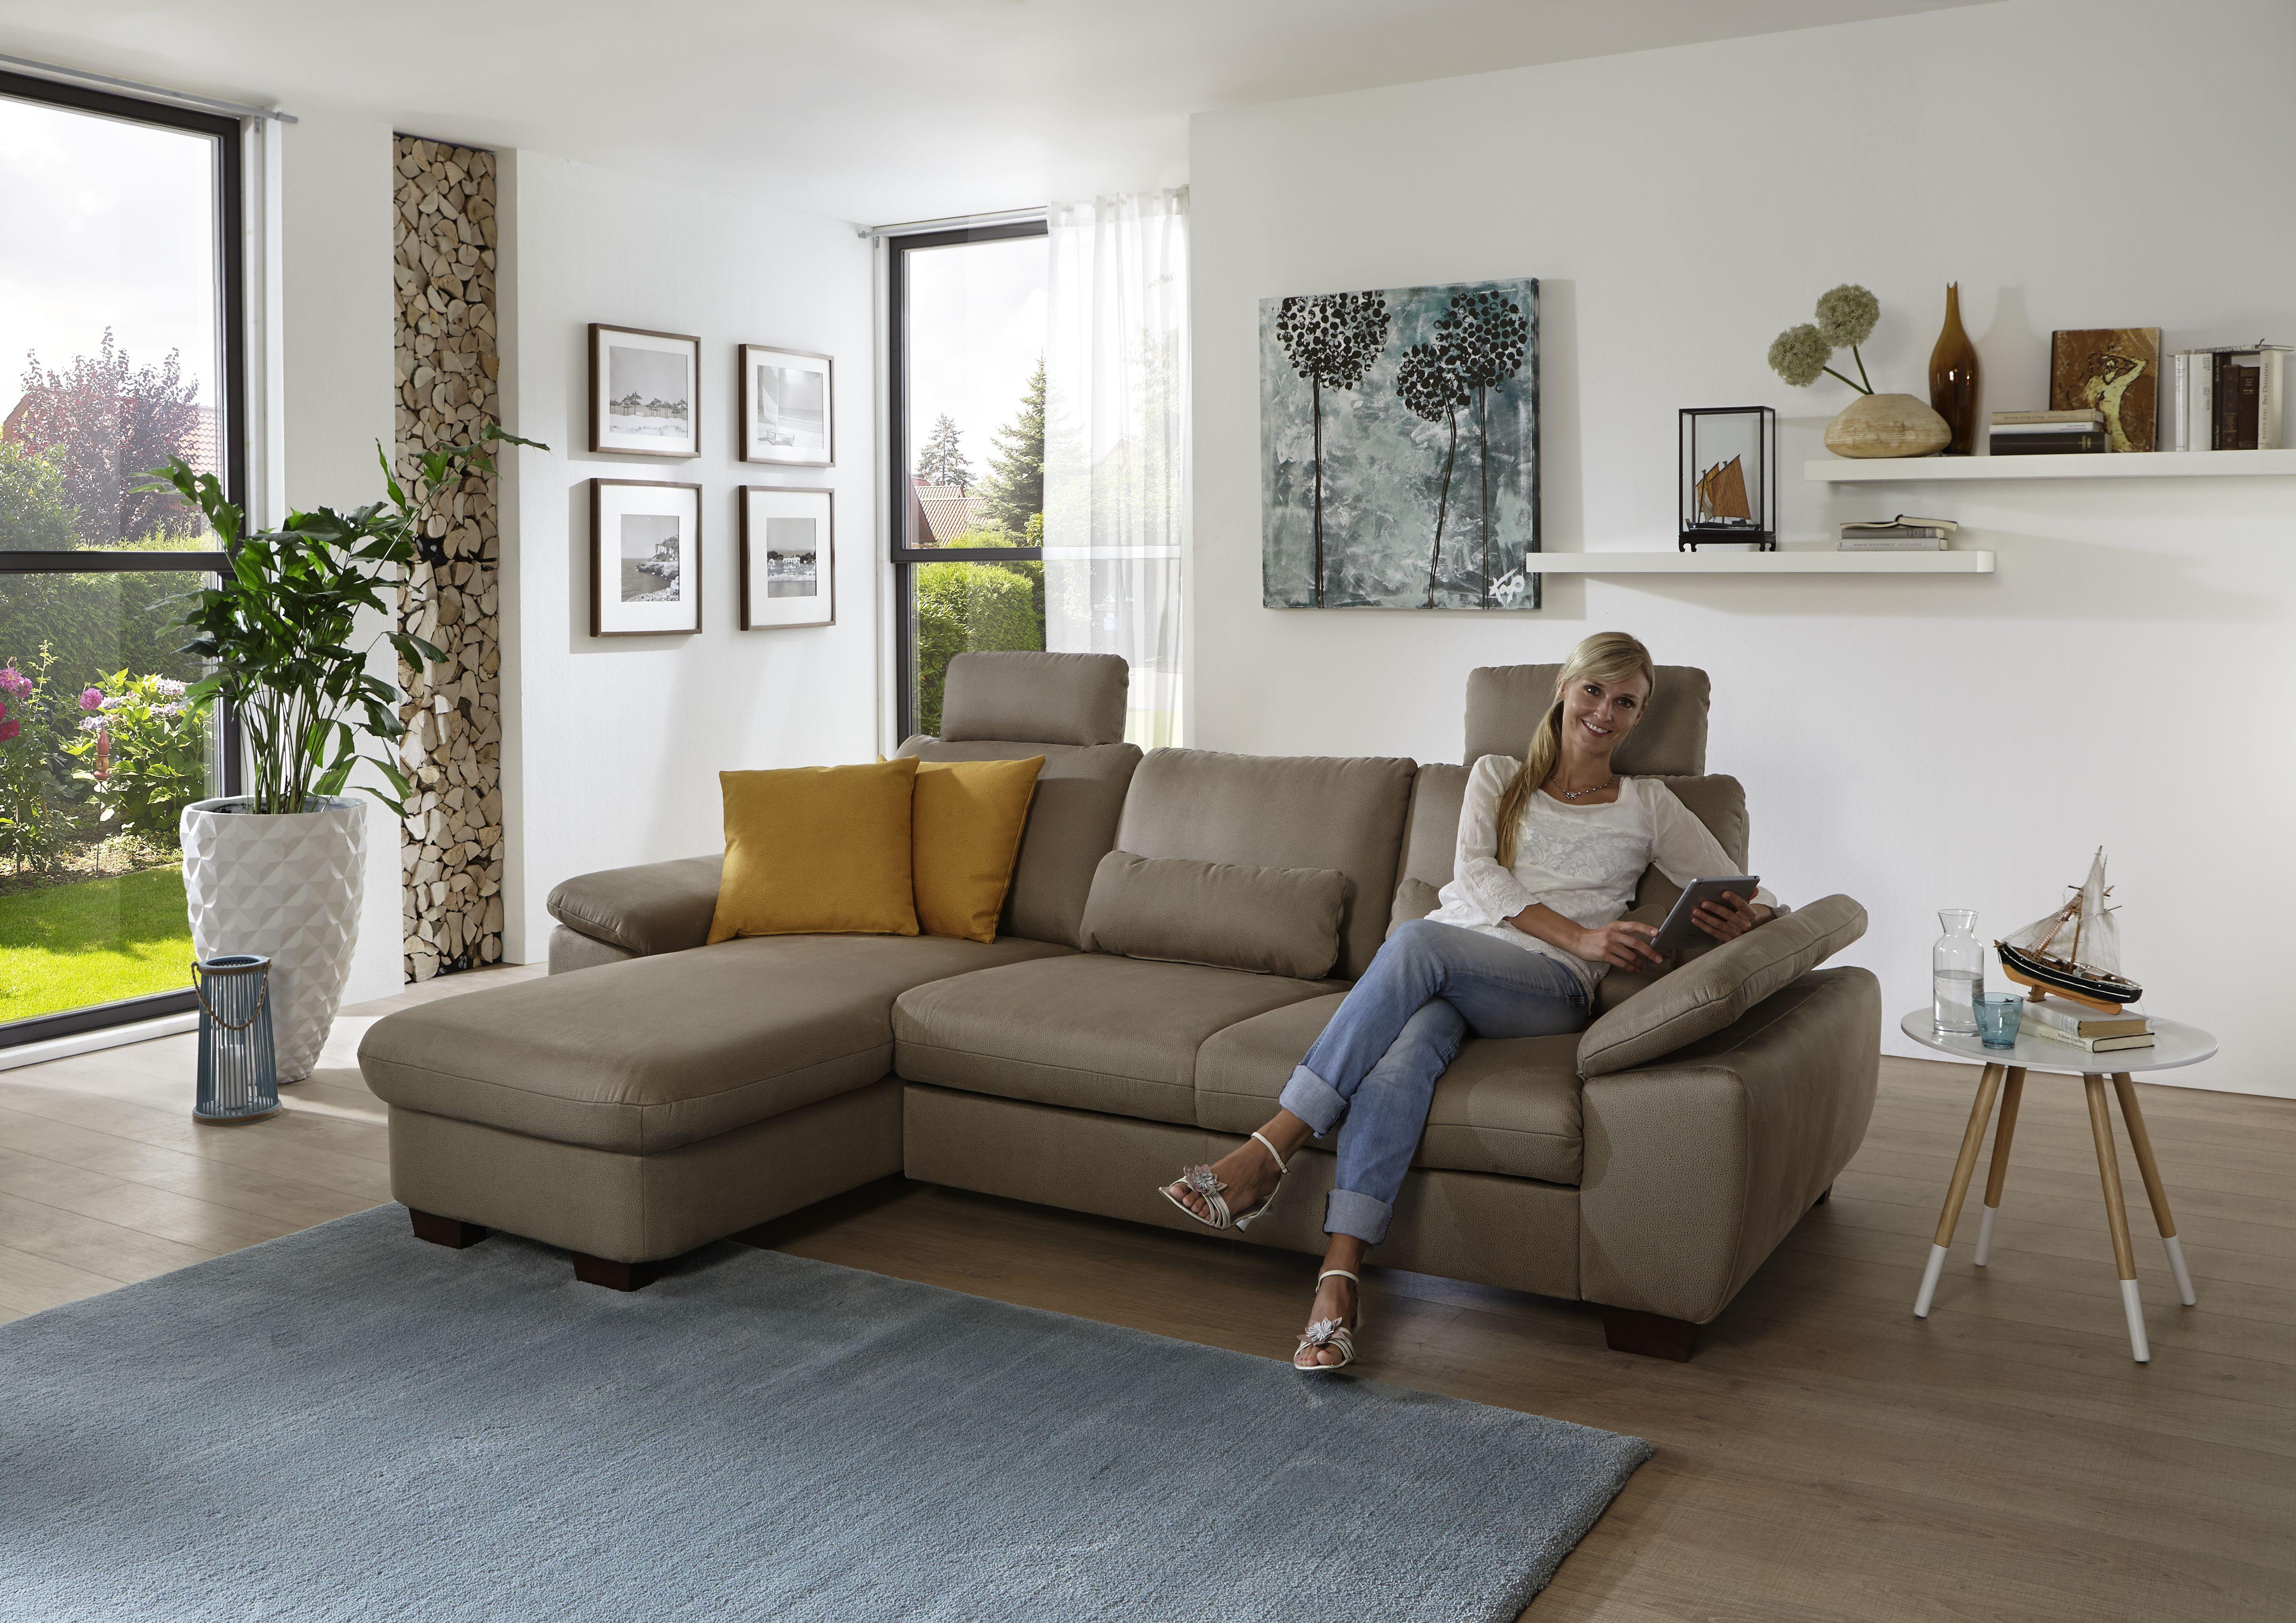 Top Ergebnis 50 Genial sofa Grau Design Bild 2017 Kgit4 2017